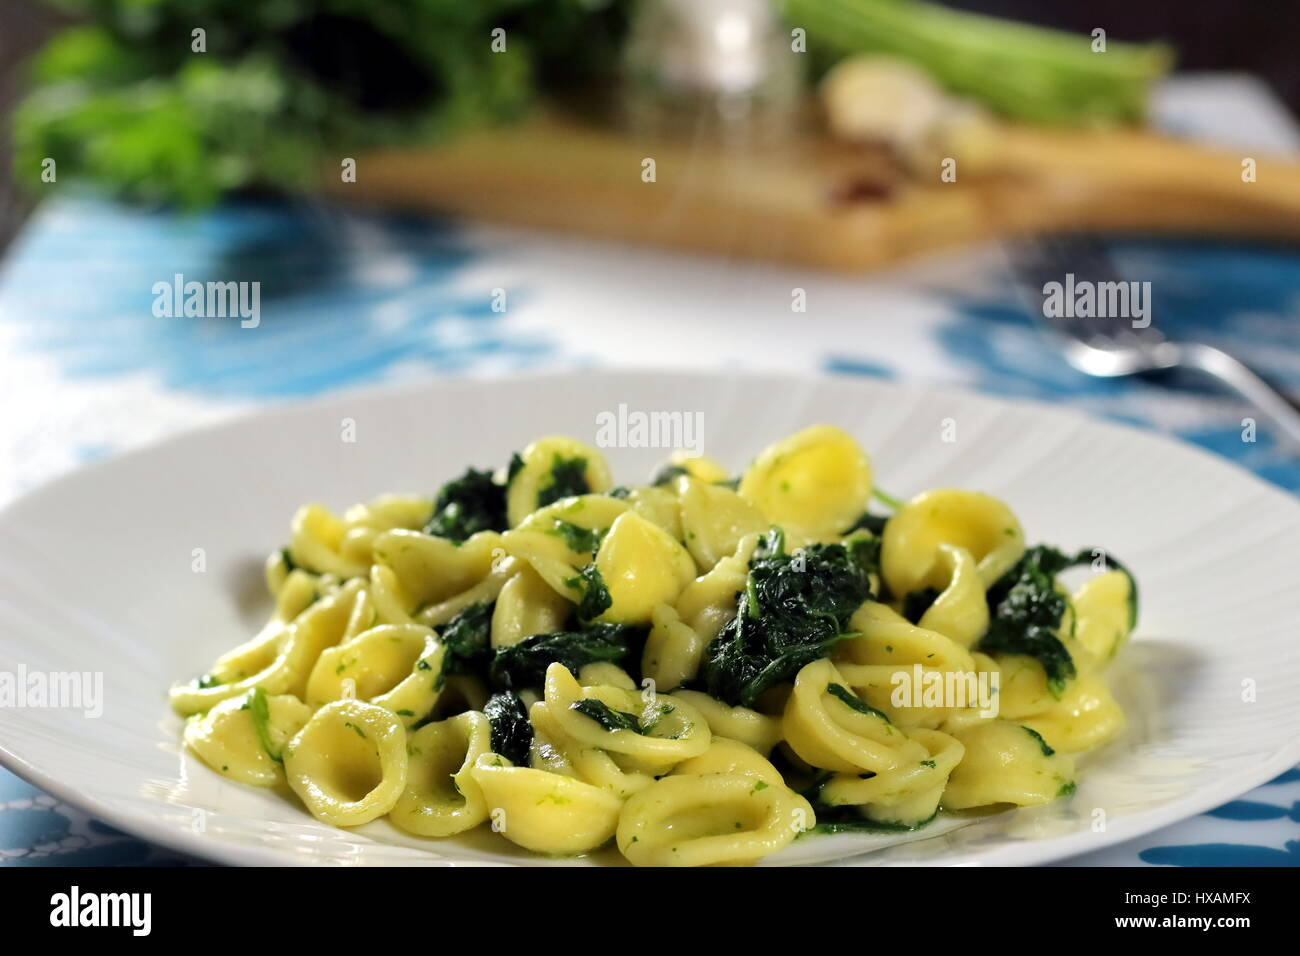 Turnip greens (collard greens) pasta (Italian Orecchiette alle cime di rapa) served in a white dish with fork on - Stock Image